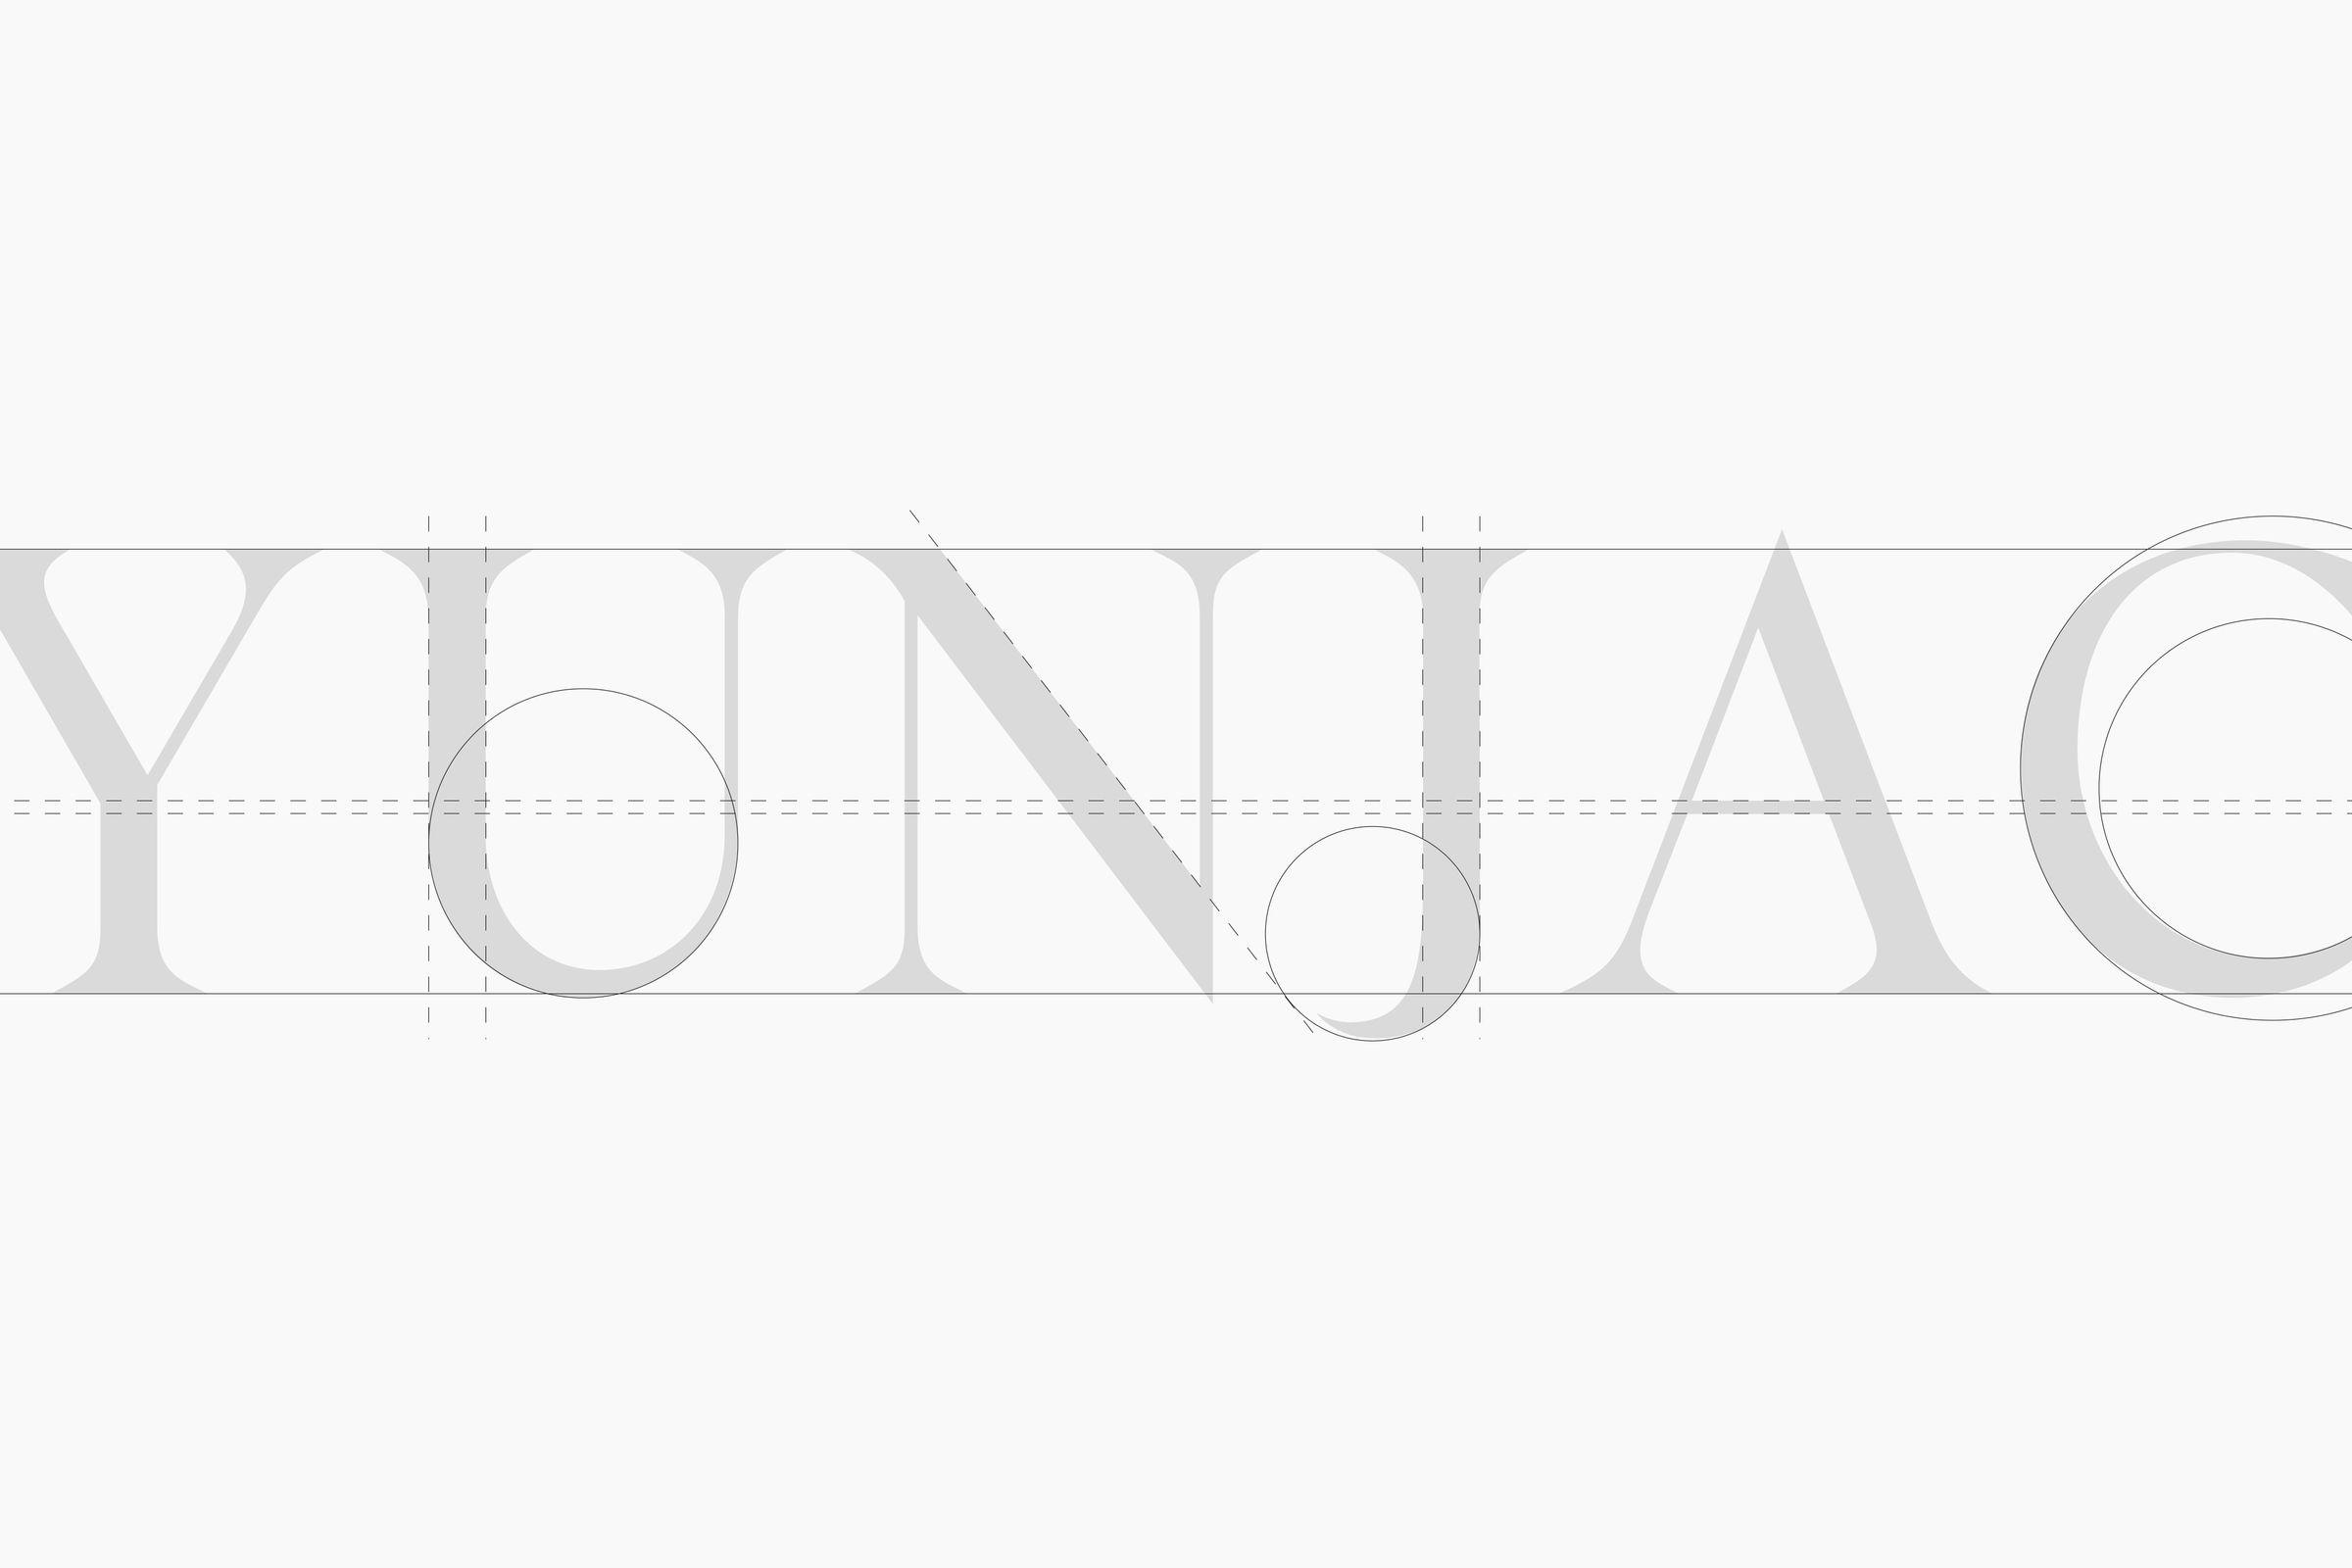 Yunjac logo design typography details